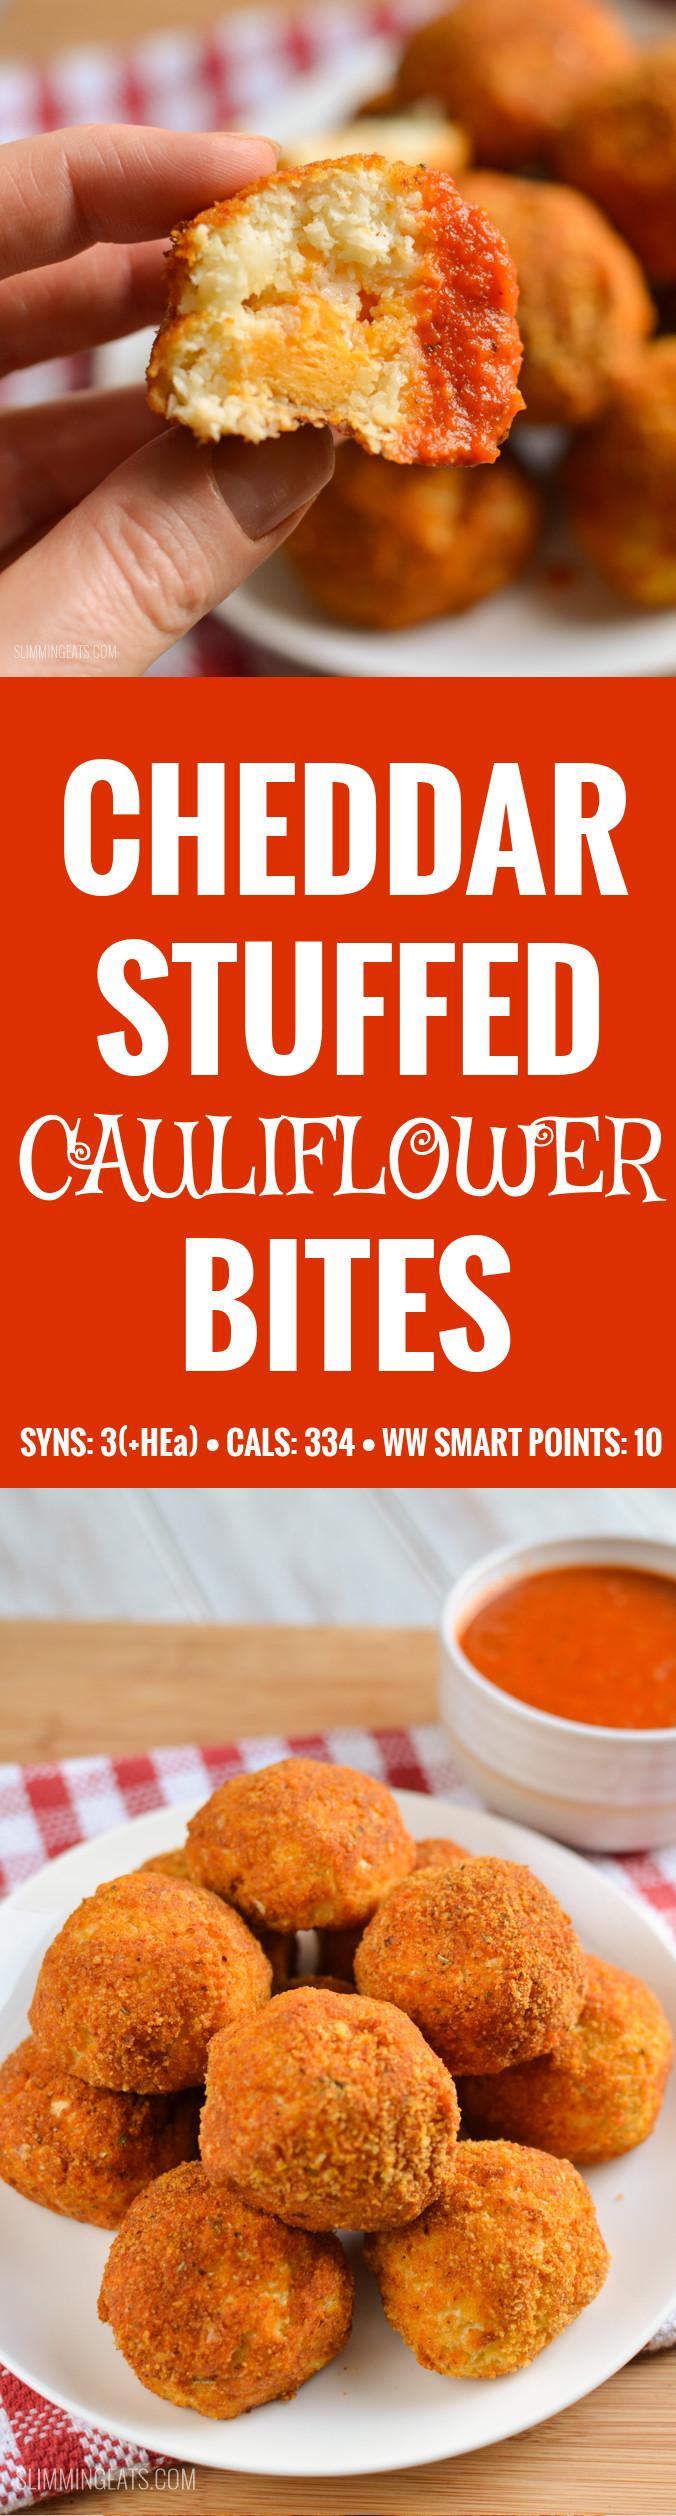 Slimming Eats - gluten free, vegetarian, Slimming World and Weight Watchers friendly